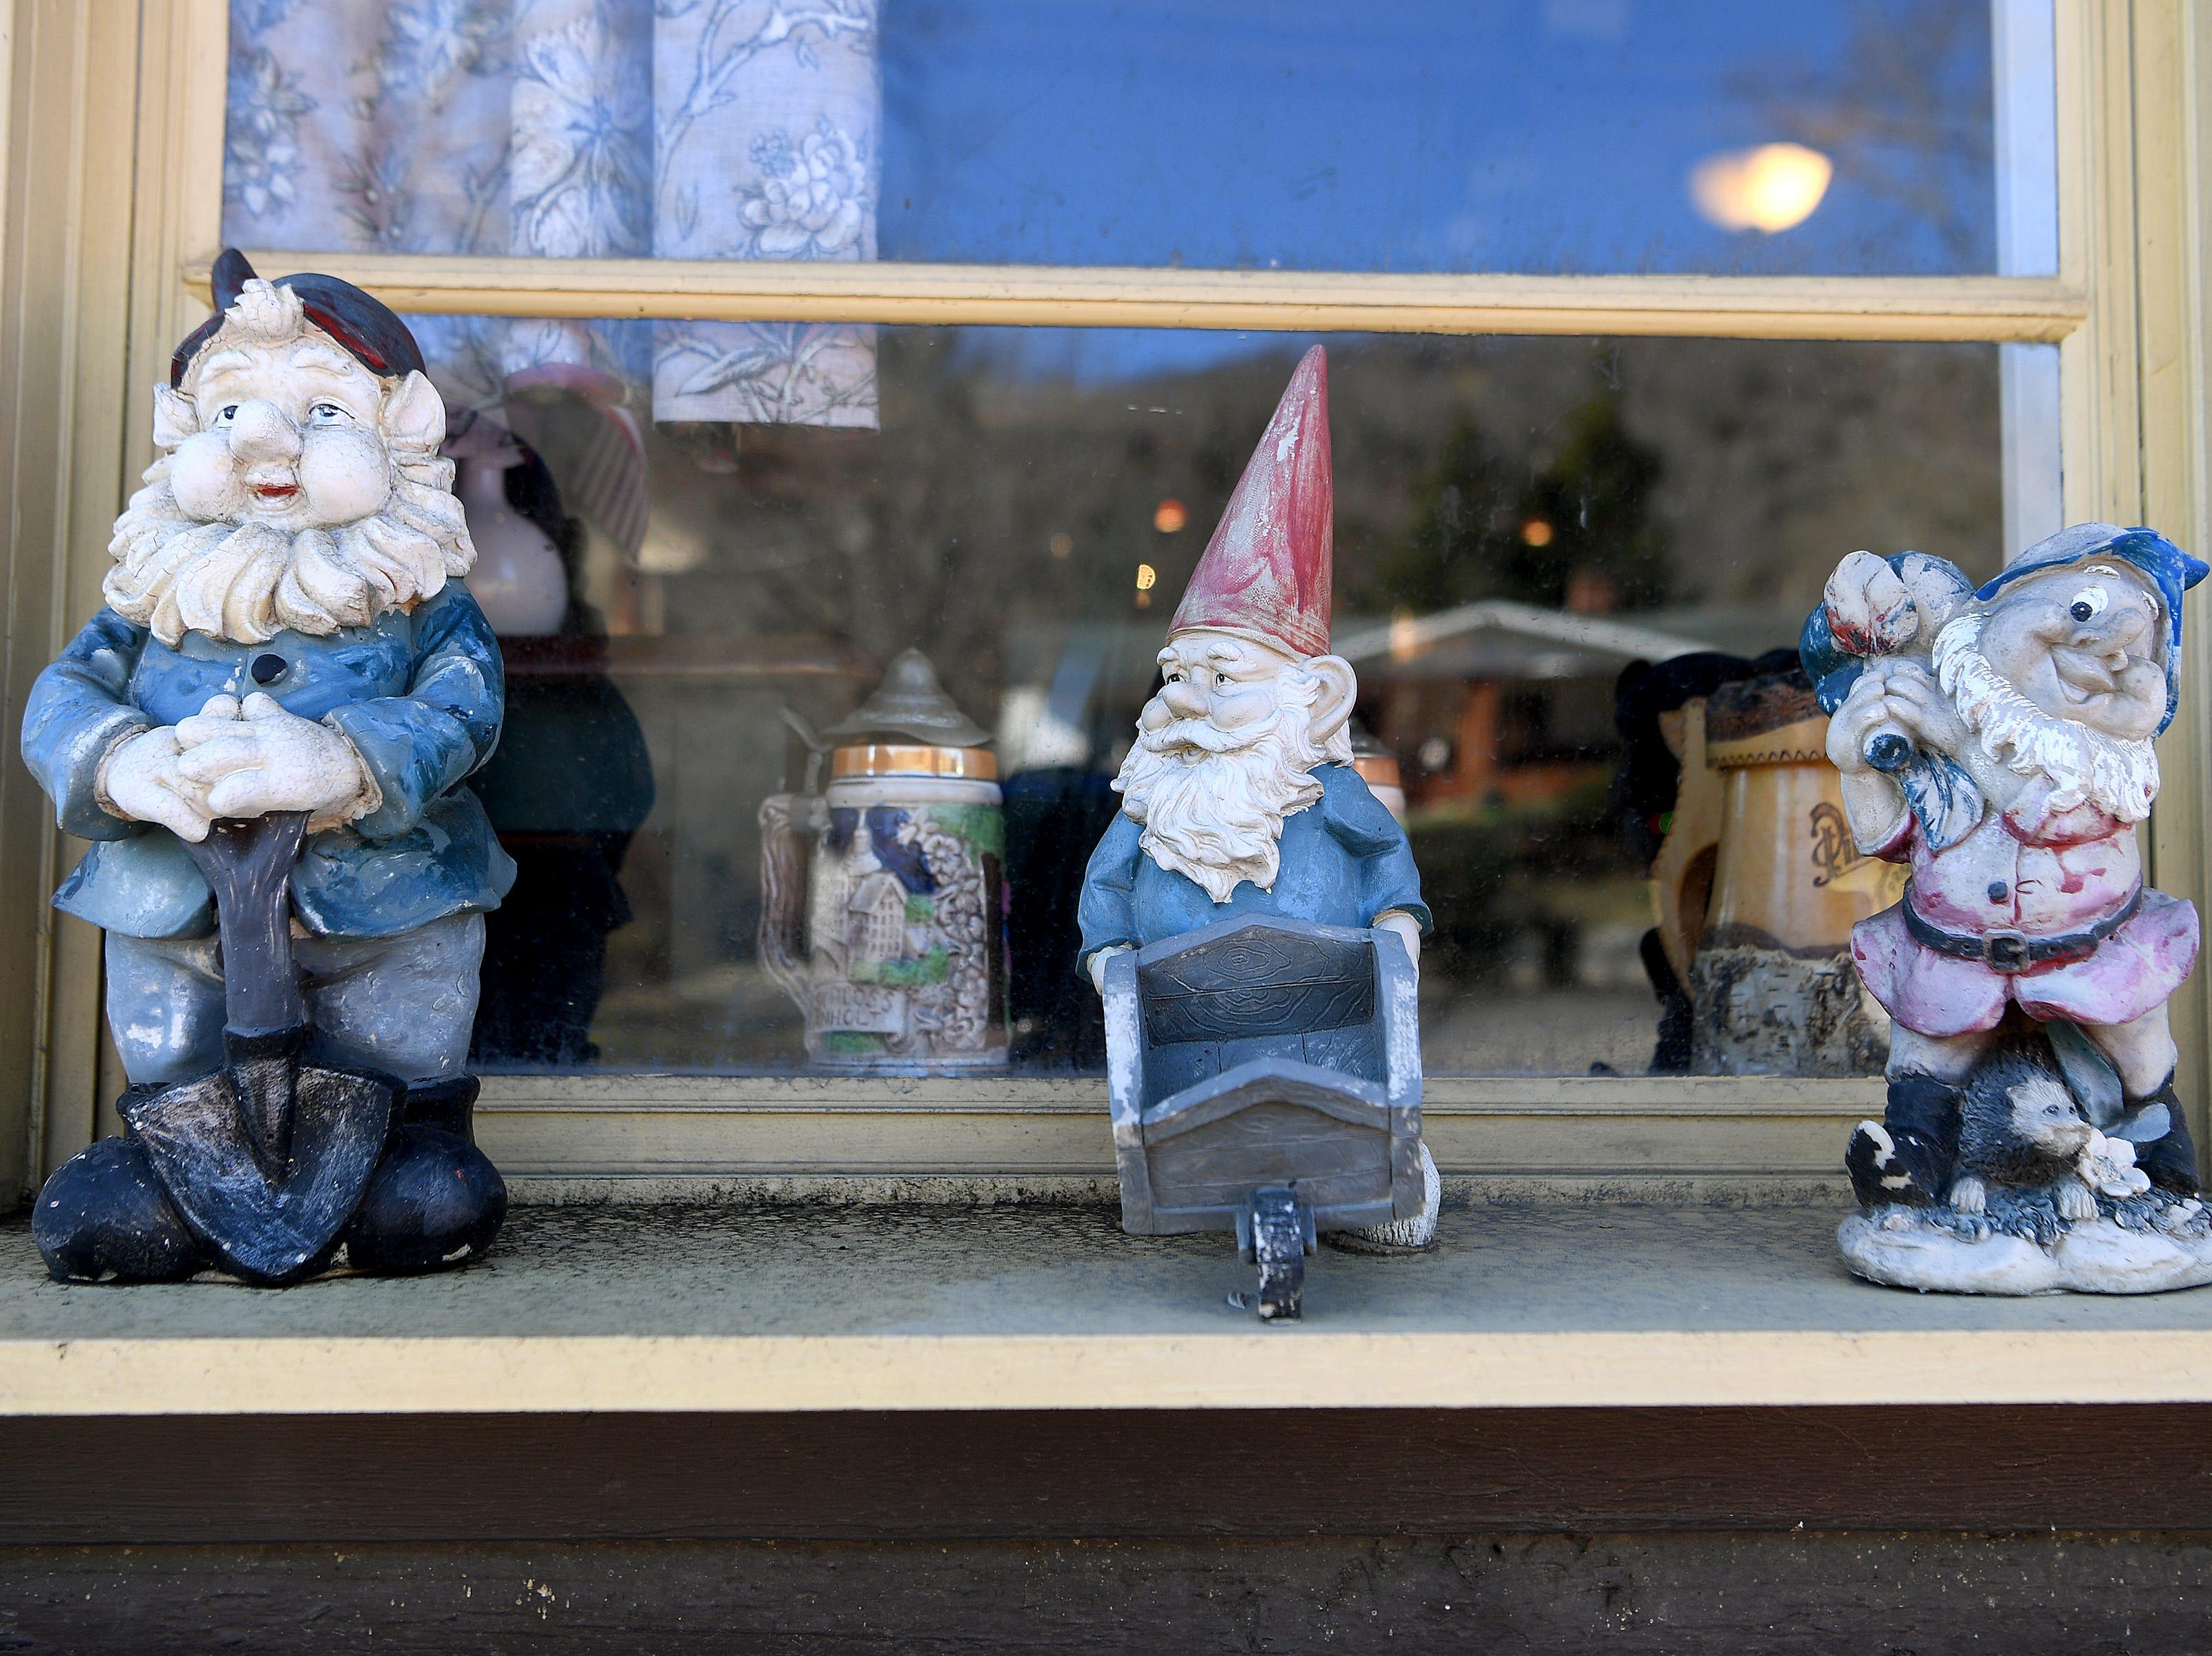 Gnomes sit on a window ledge outside of the Bavarian Restaurant & Biergarten.